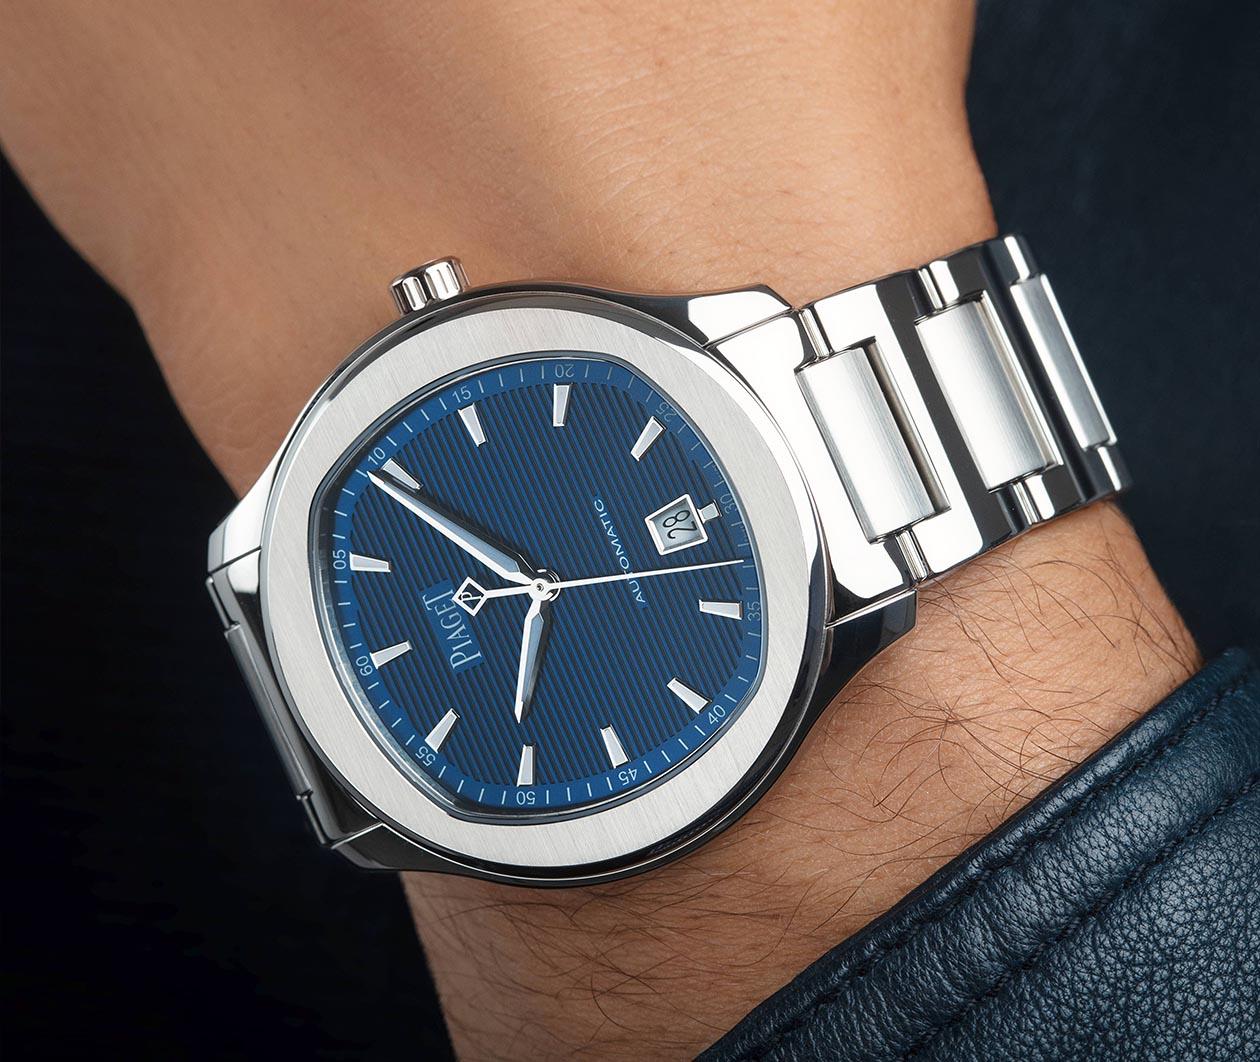 Piaget PoloS watch G0A41002 Carousel 2 FINAL